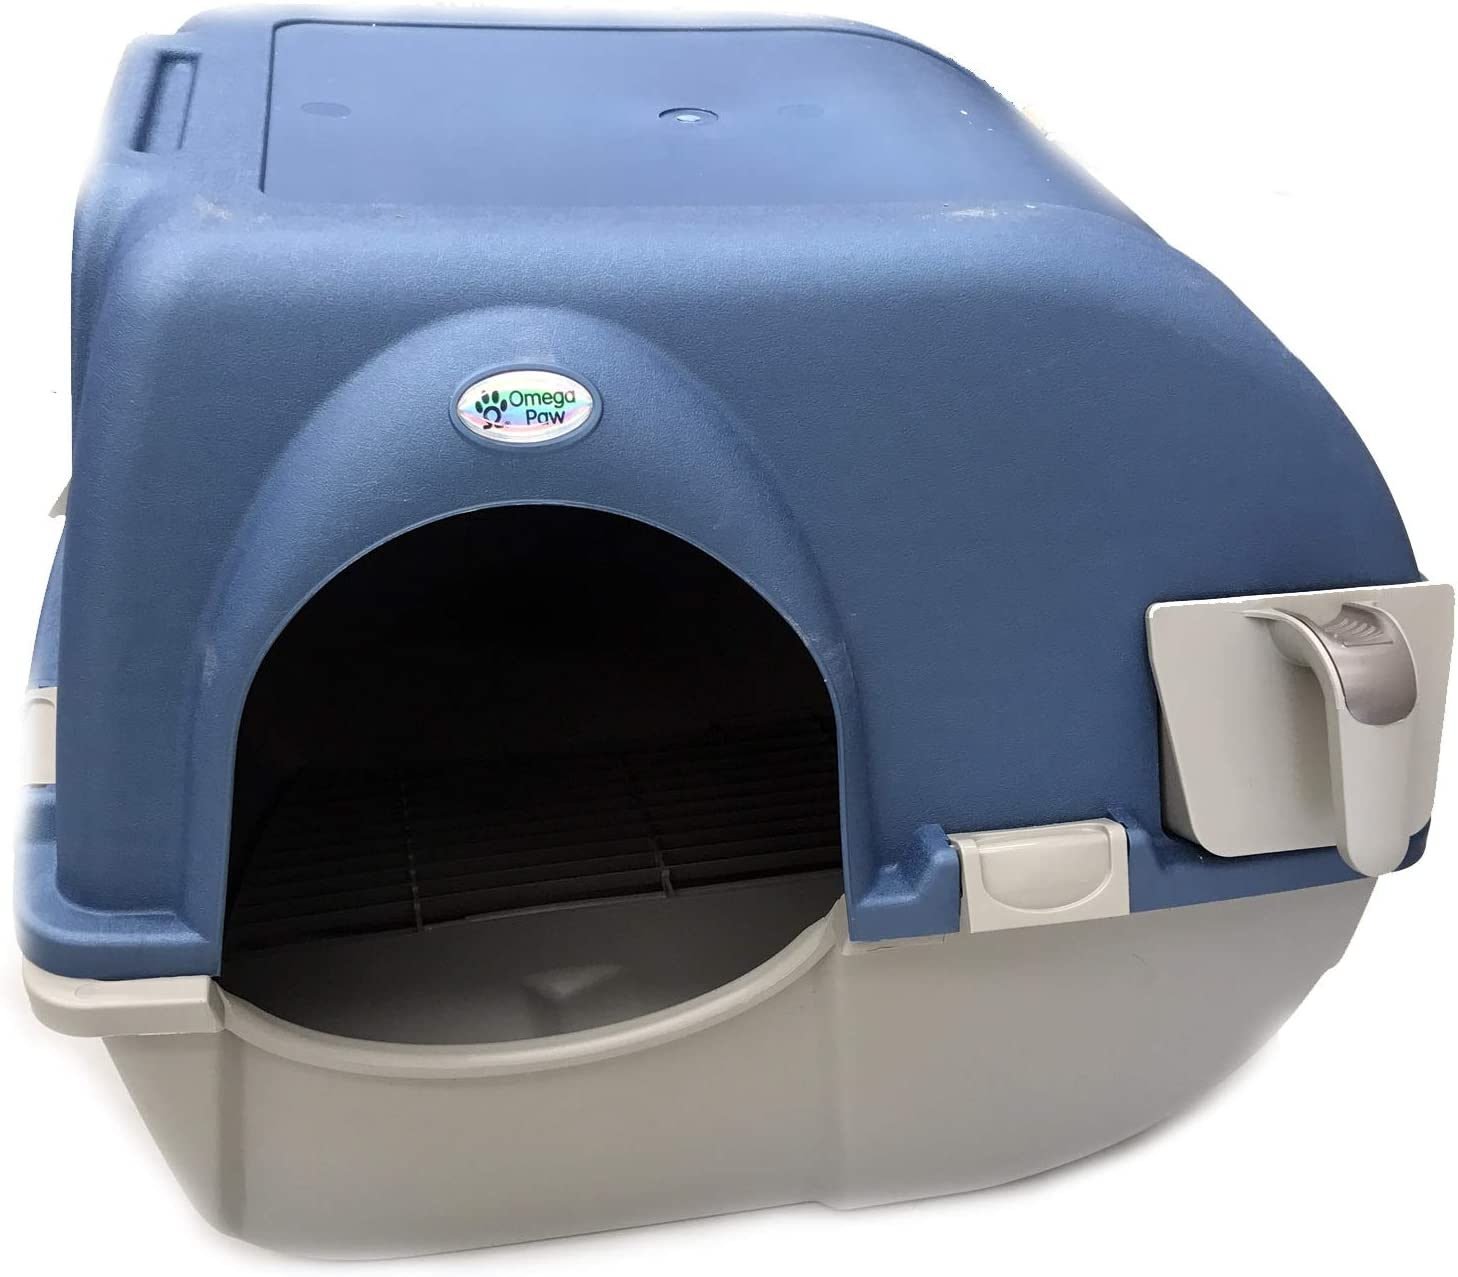 Omega Paw Roll n' Clean - Gatera para gatos (autolimpiable, semiautomática, tamaño grande) - L - 47cm x 54,60cm x 50,8cm - color Azul